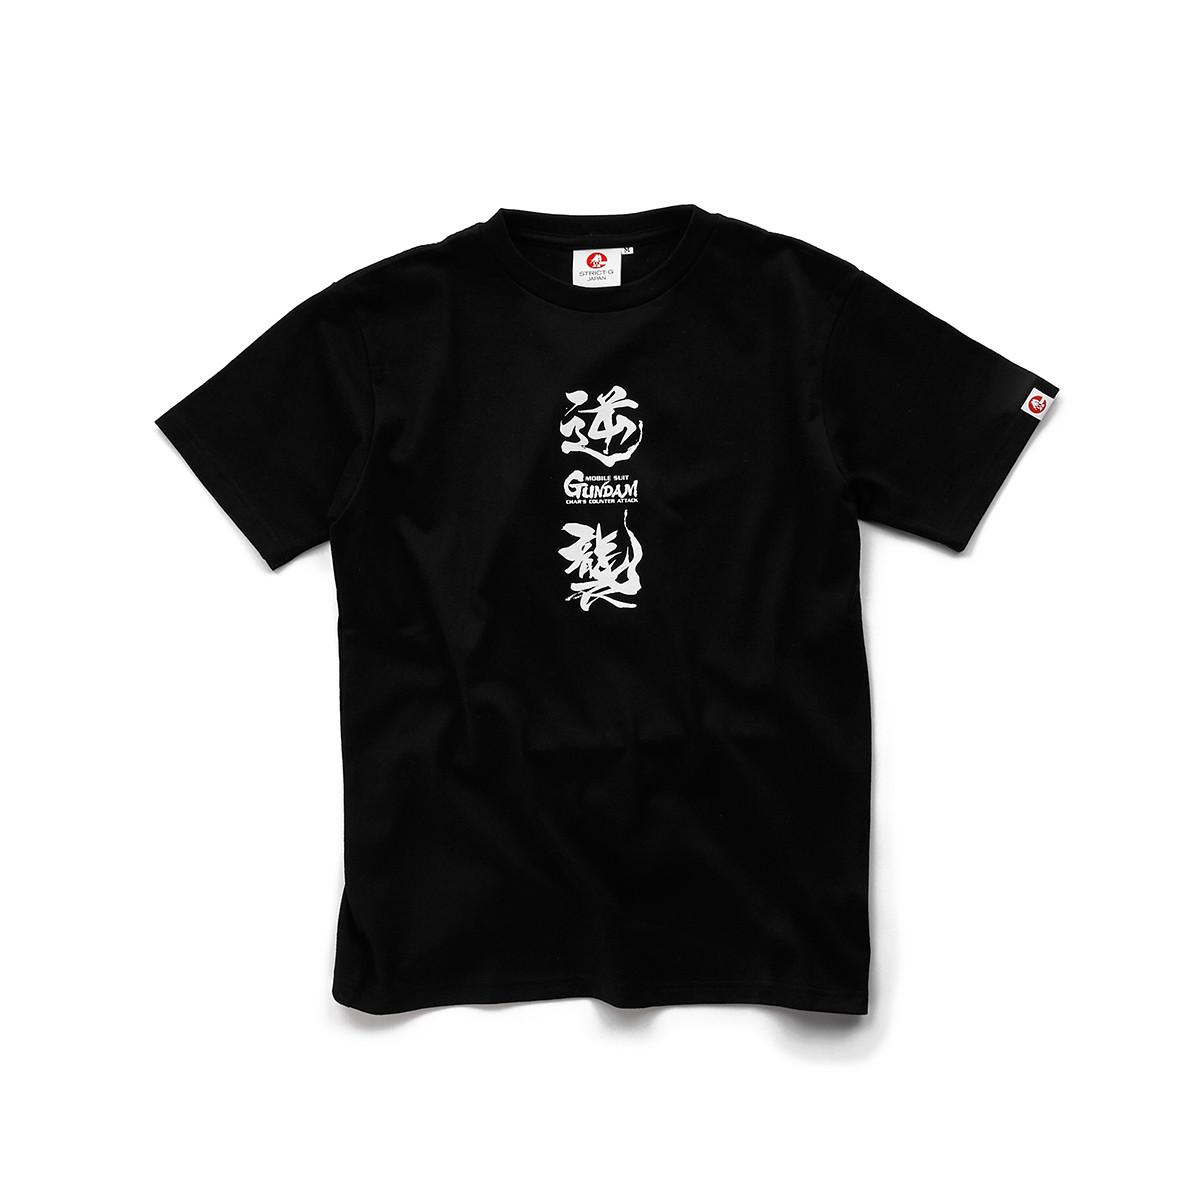 Sazabi T-shirt—Mobile Suit Gundam: Char's Counterattack/STRICT-G JAPAN Collaboration